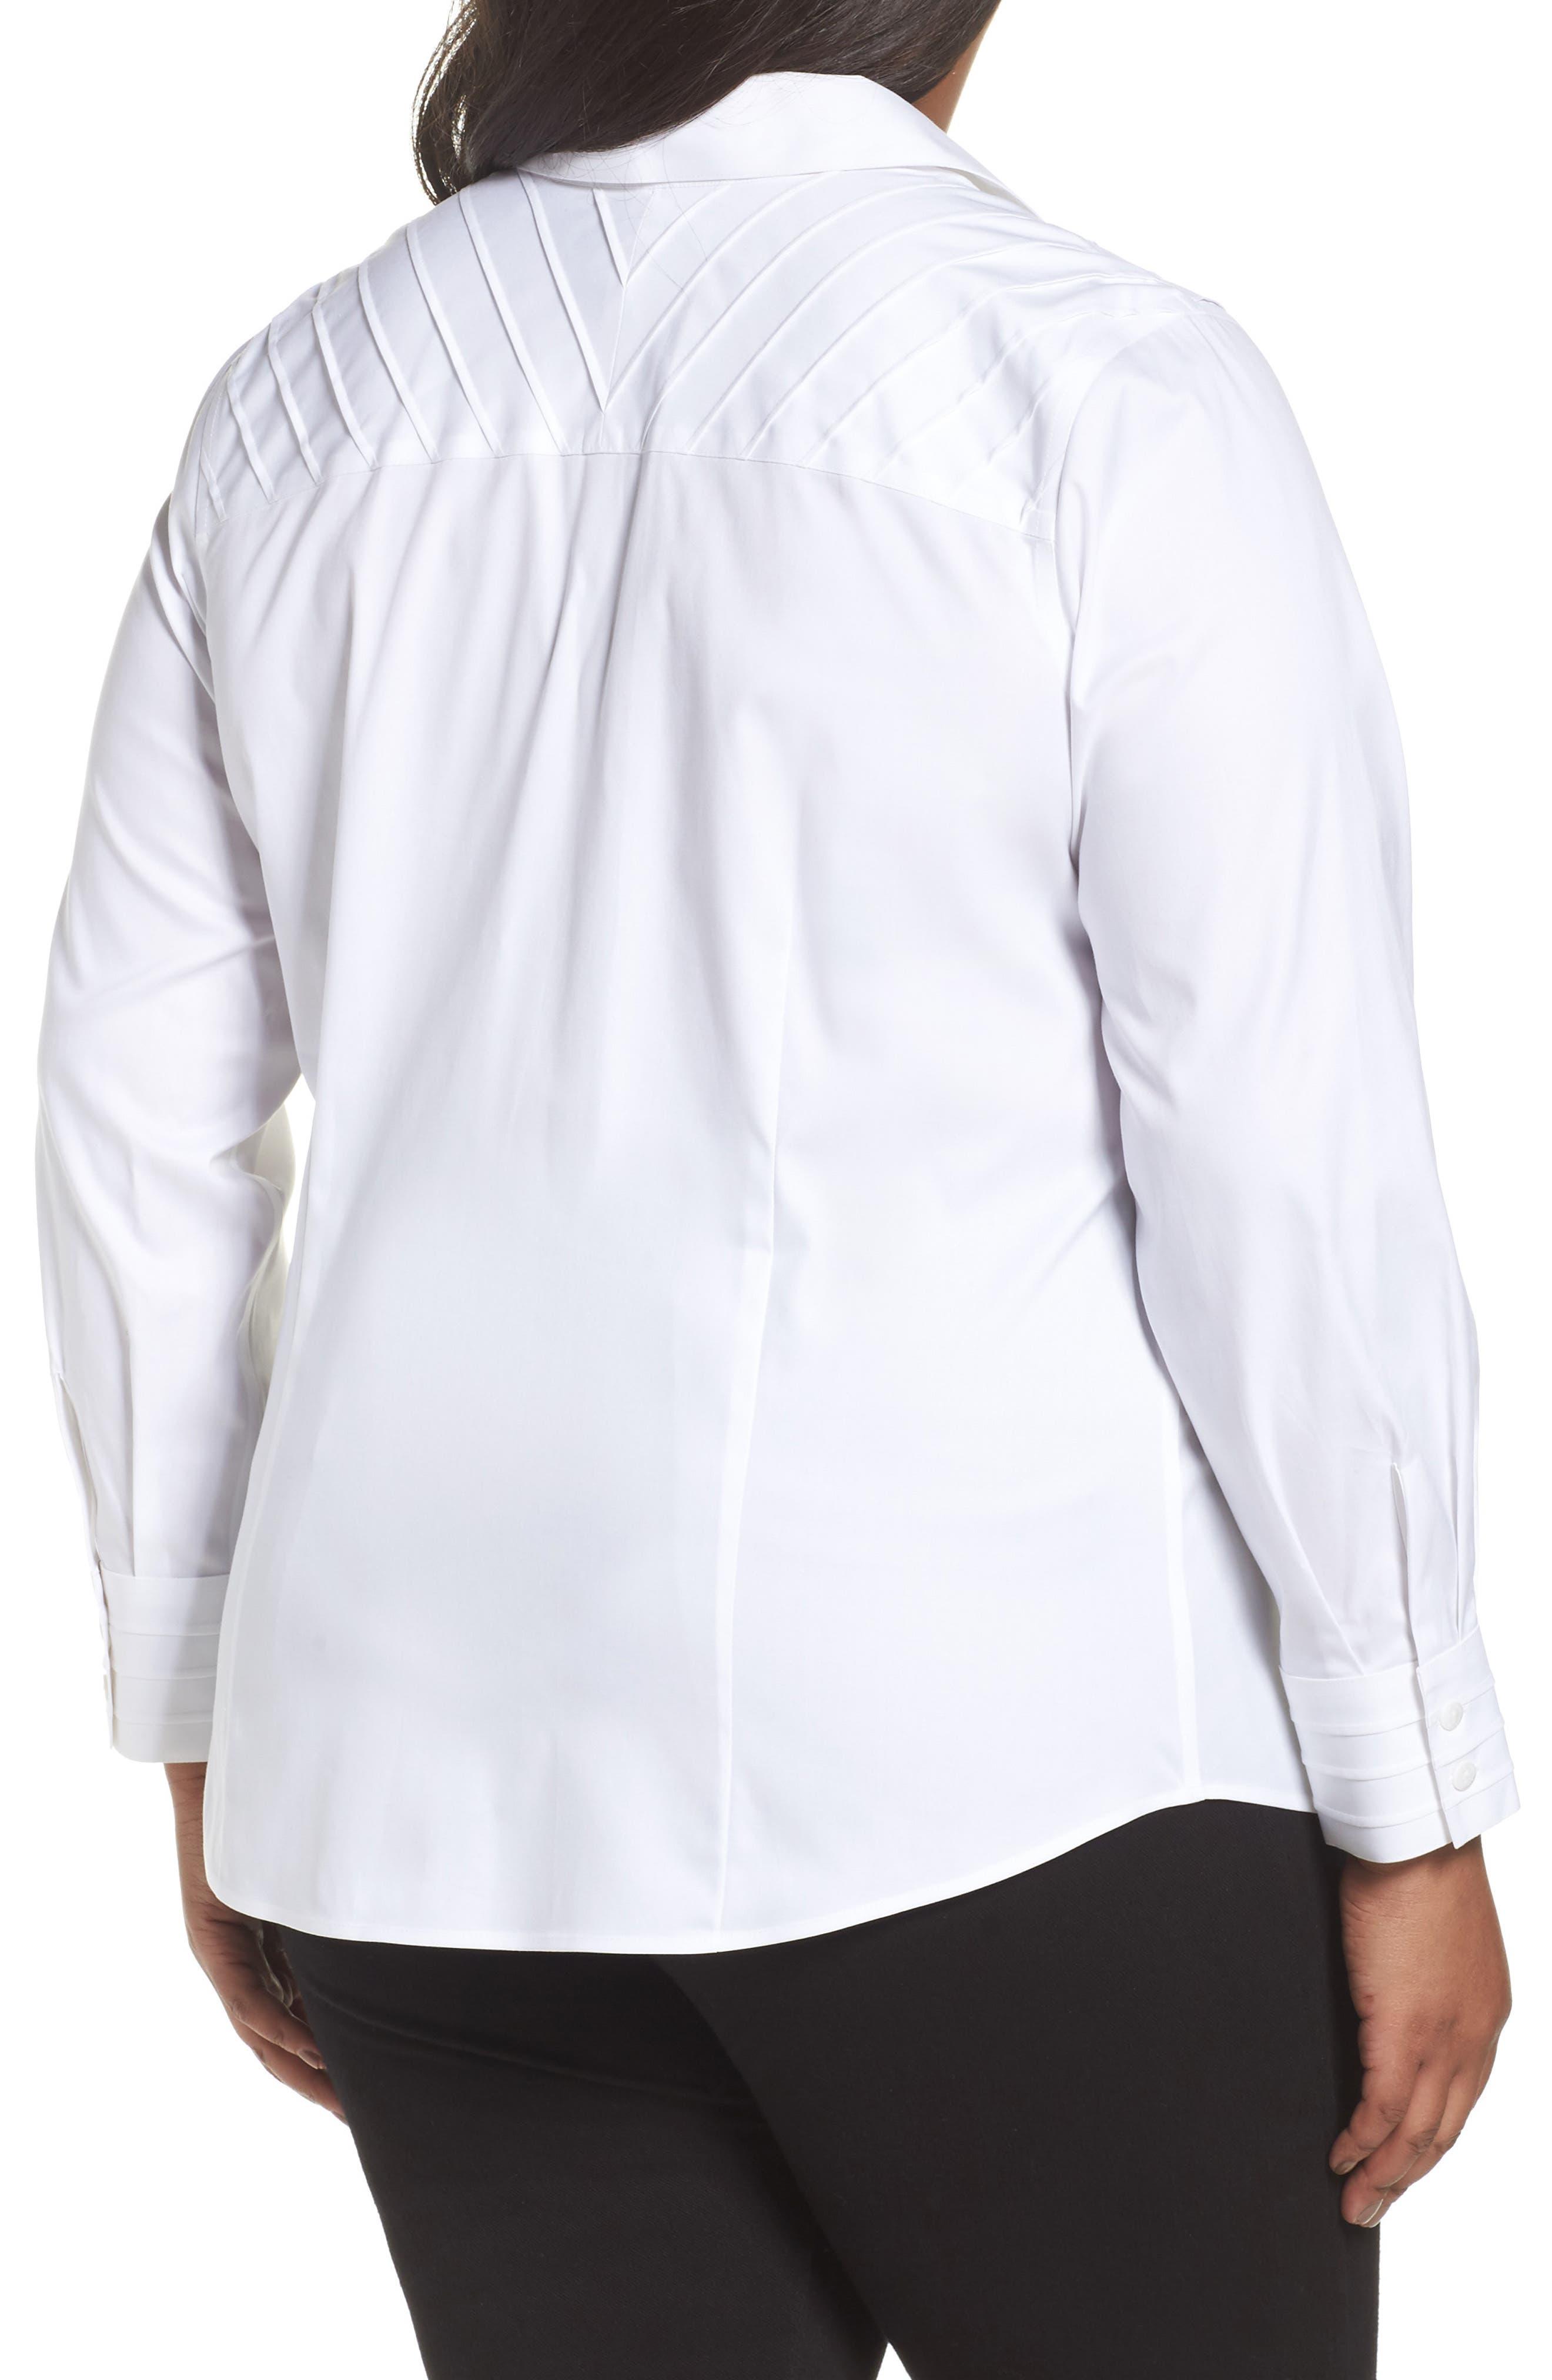 Alternate Image 2  - Foxcroft Rita Solid Stretch Cotton Top (Plus Size)